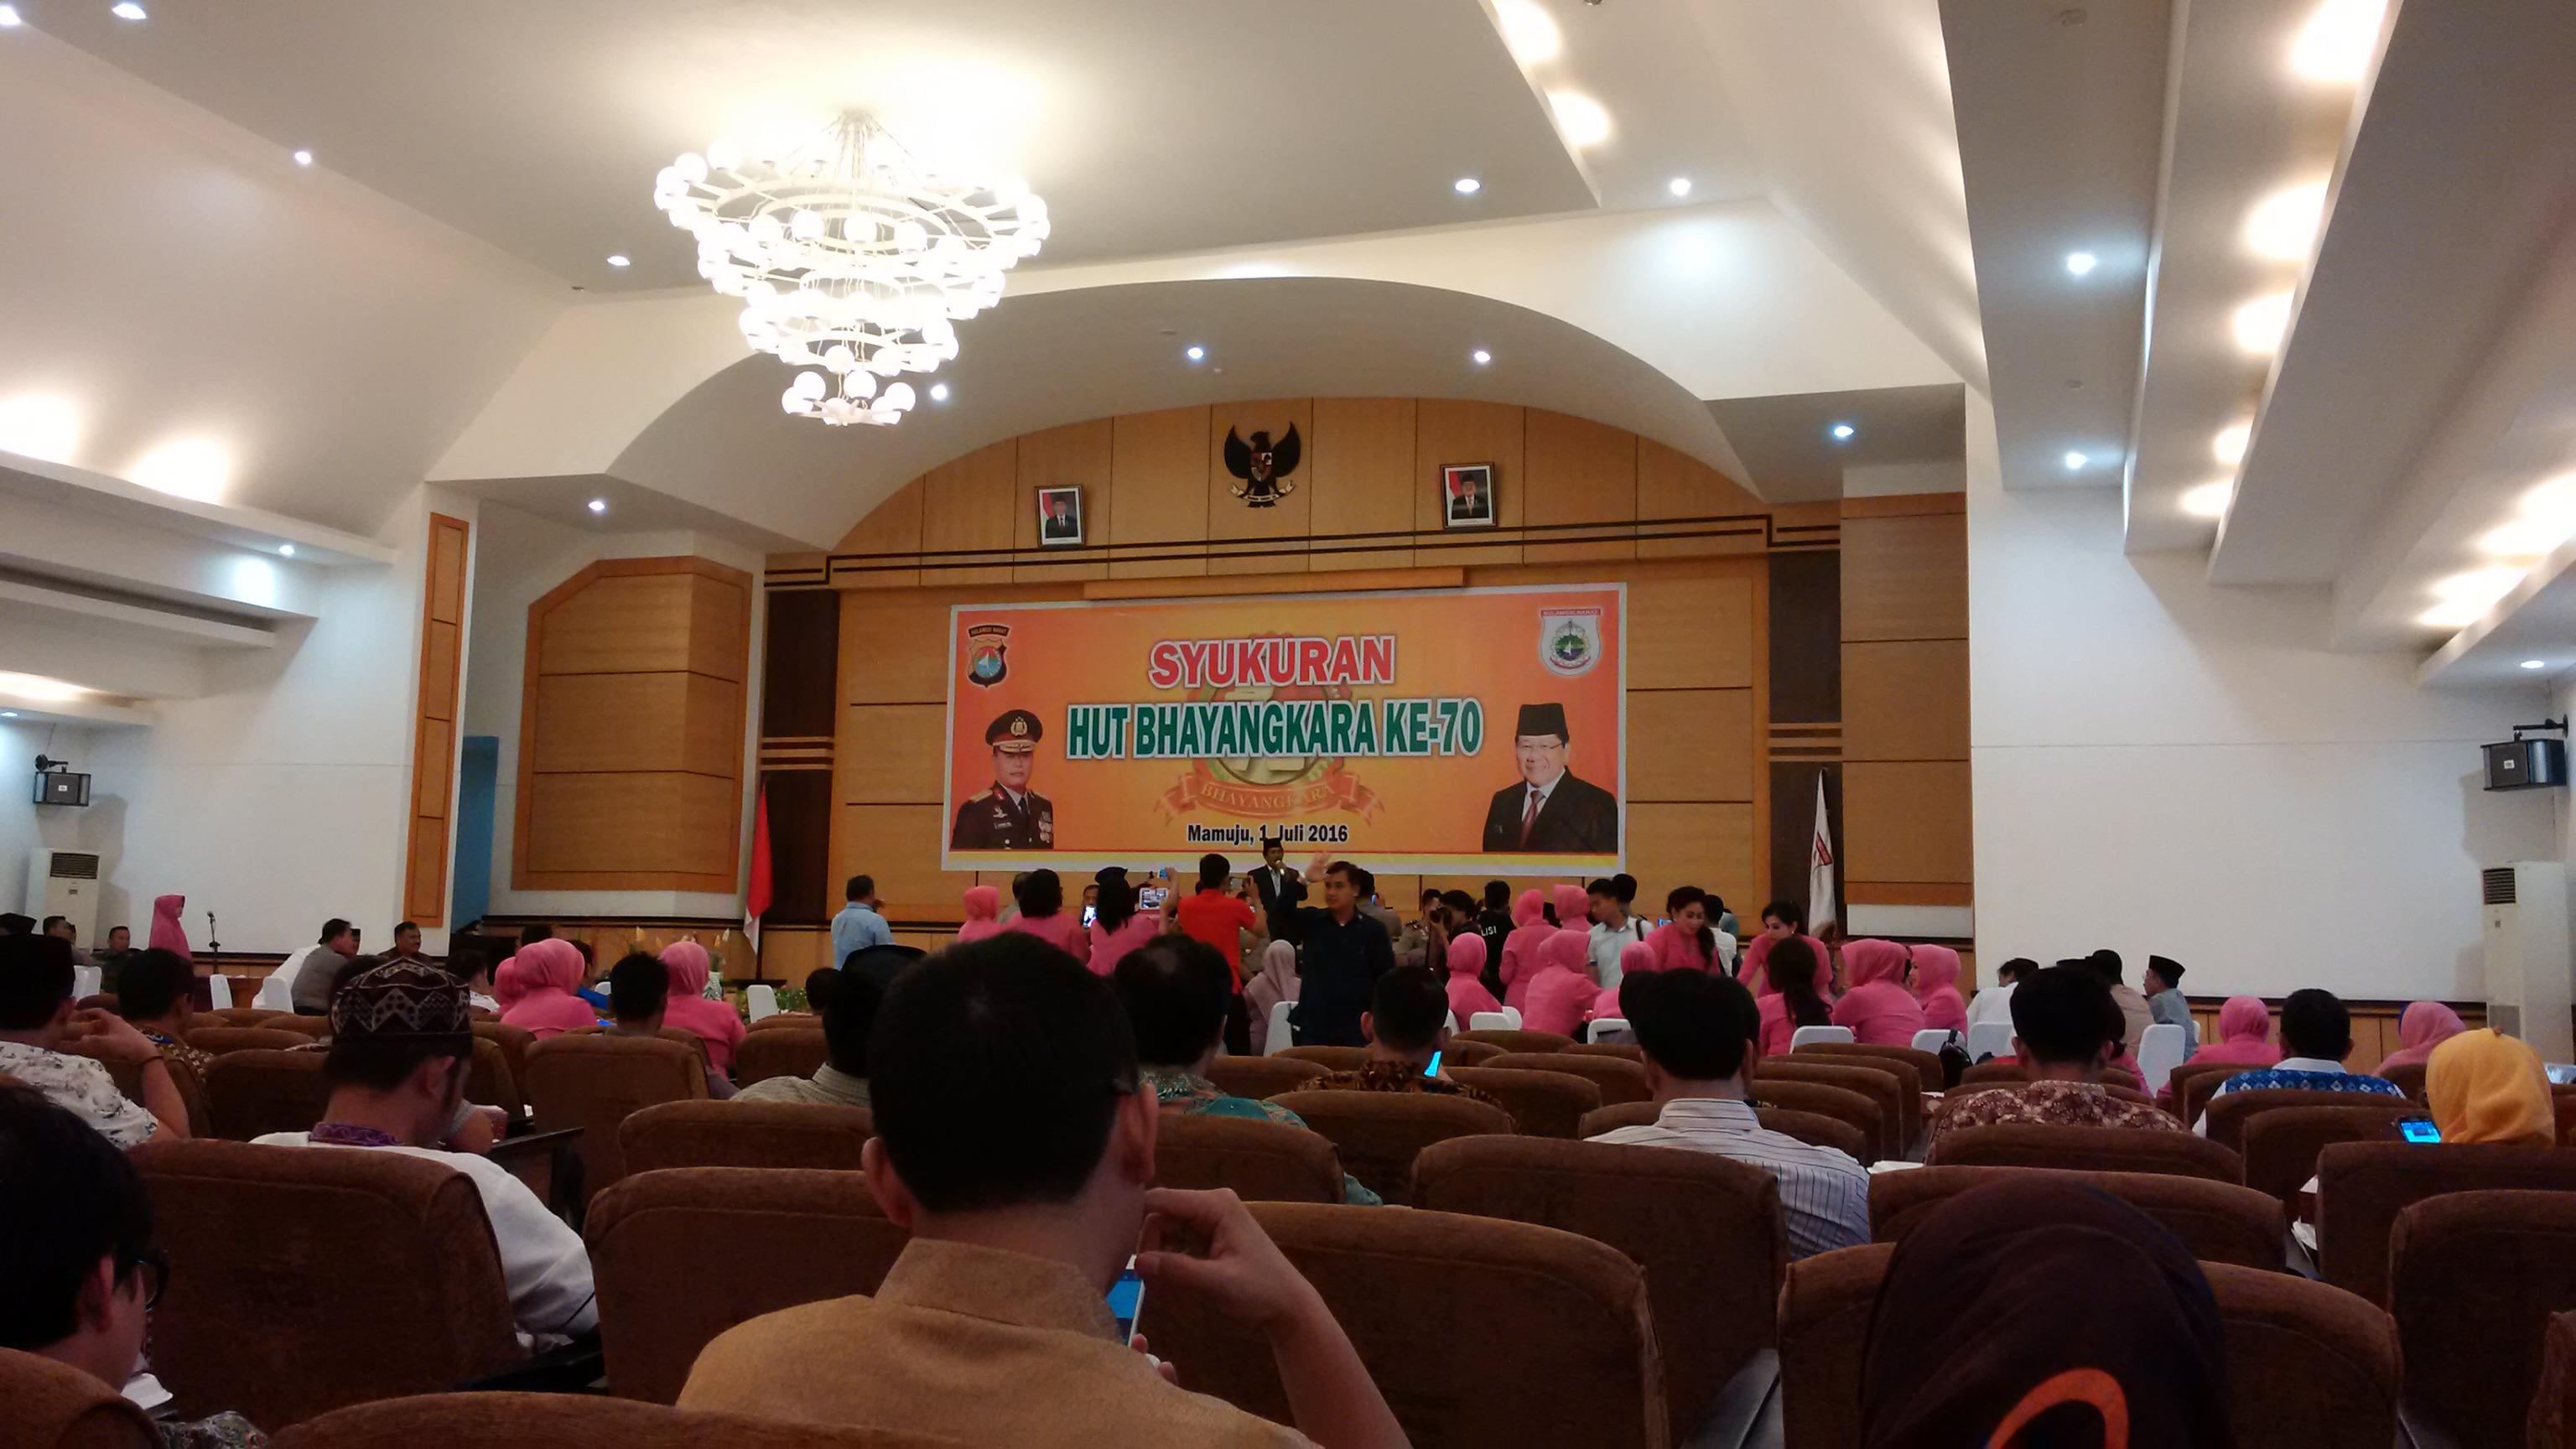 Suasana Perayaan HUT Bhayangkara Ke 70 di Kantor Gubernur Sulbar